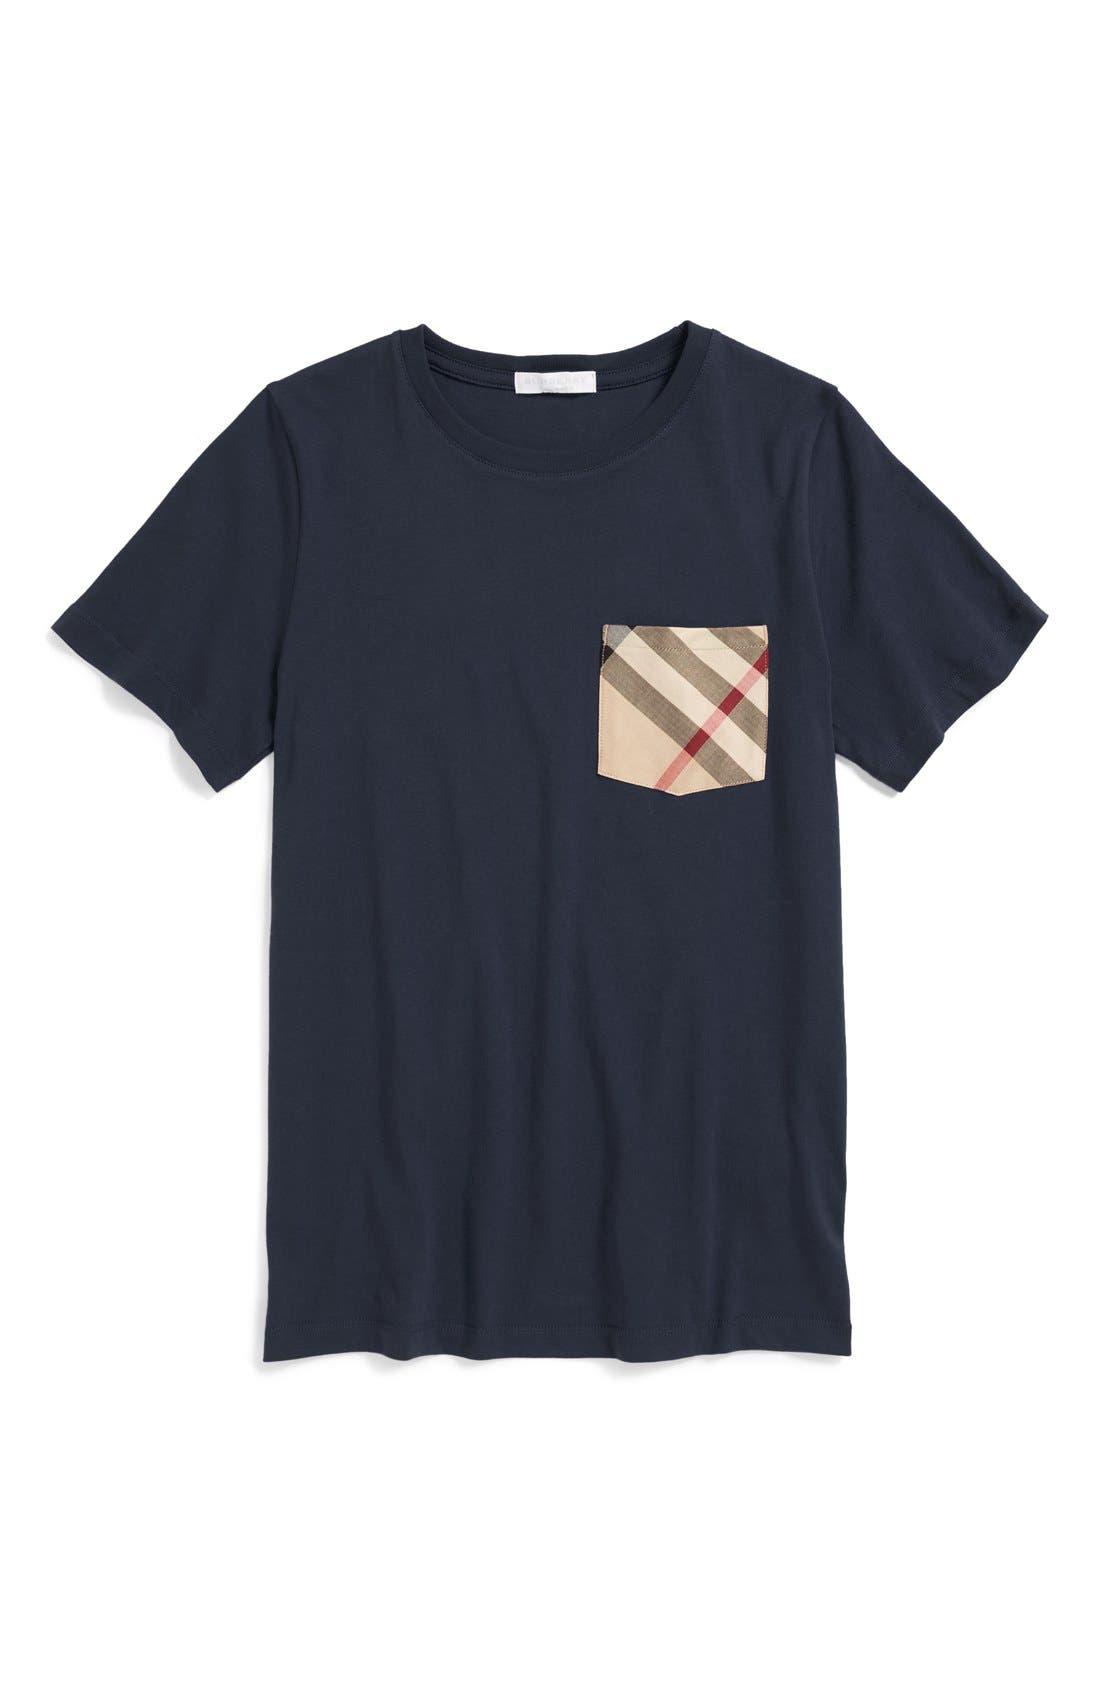 Burberry Contrast Pocket T-Shirt (Little Boys & Big Boys)